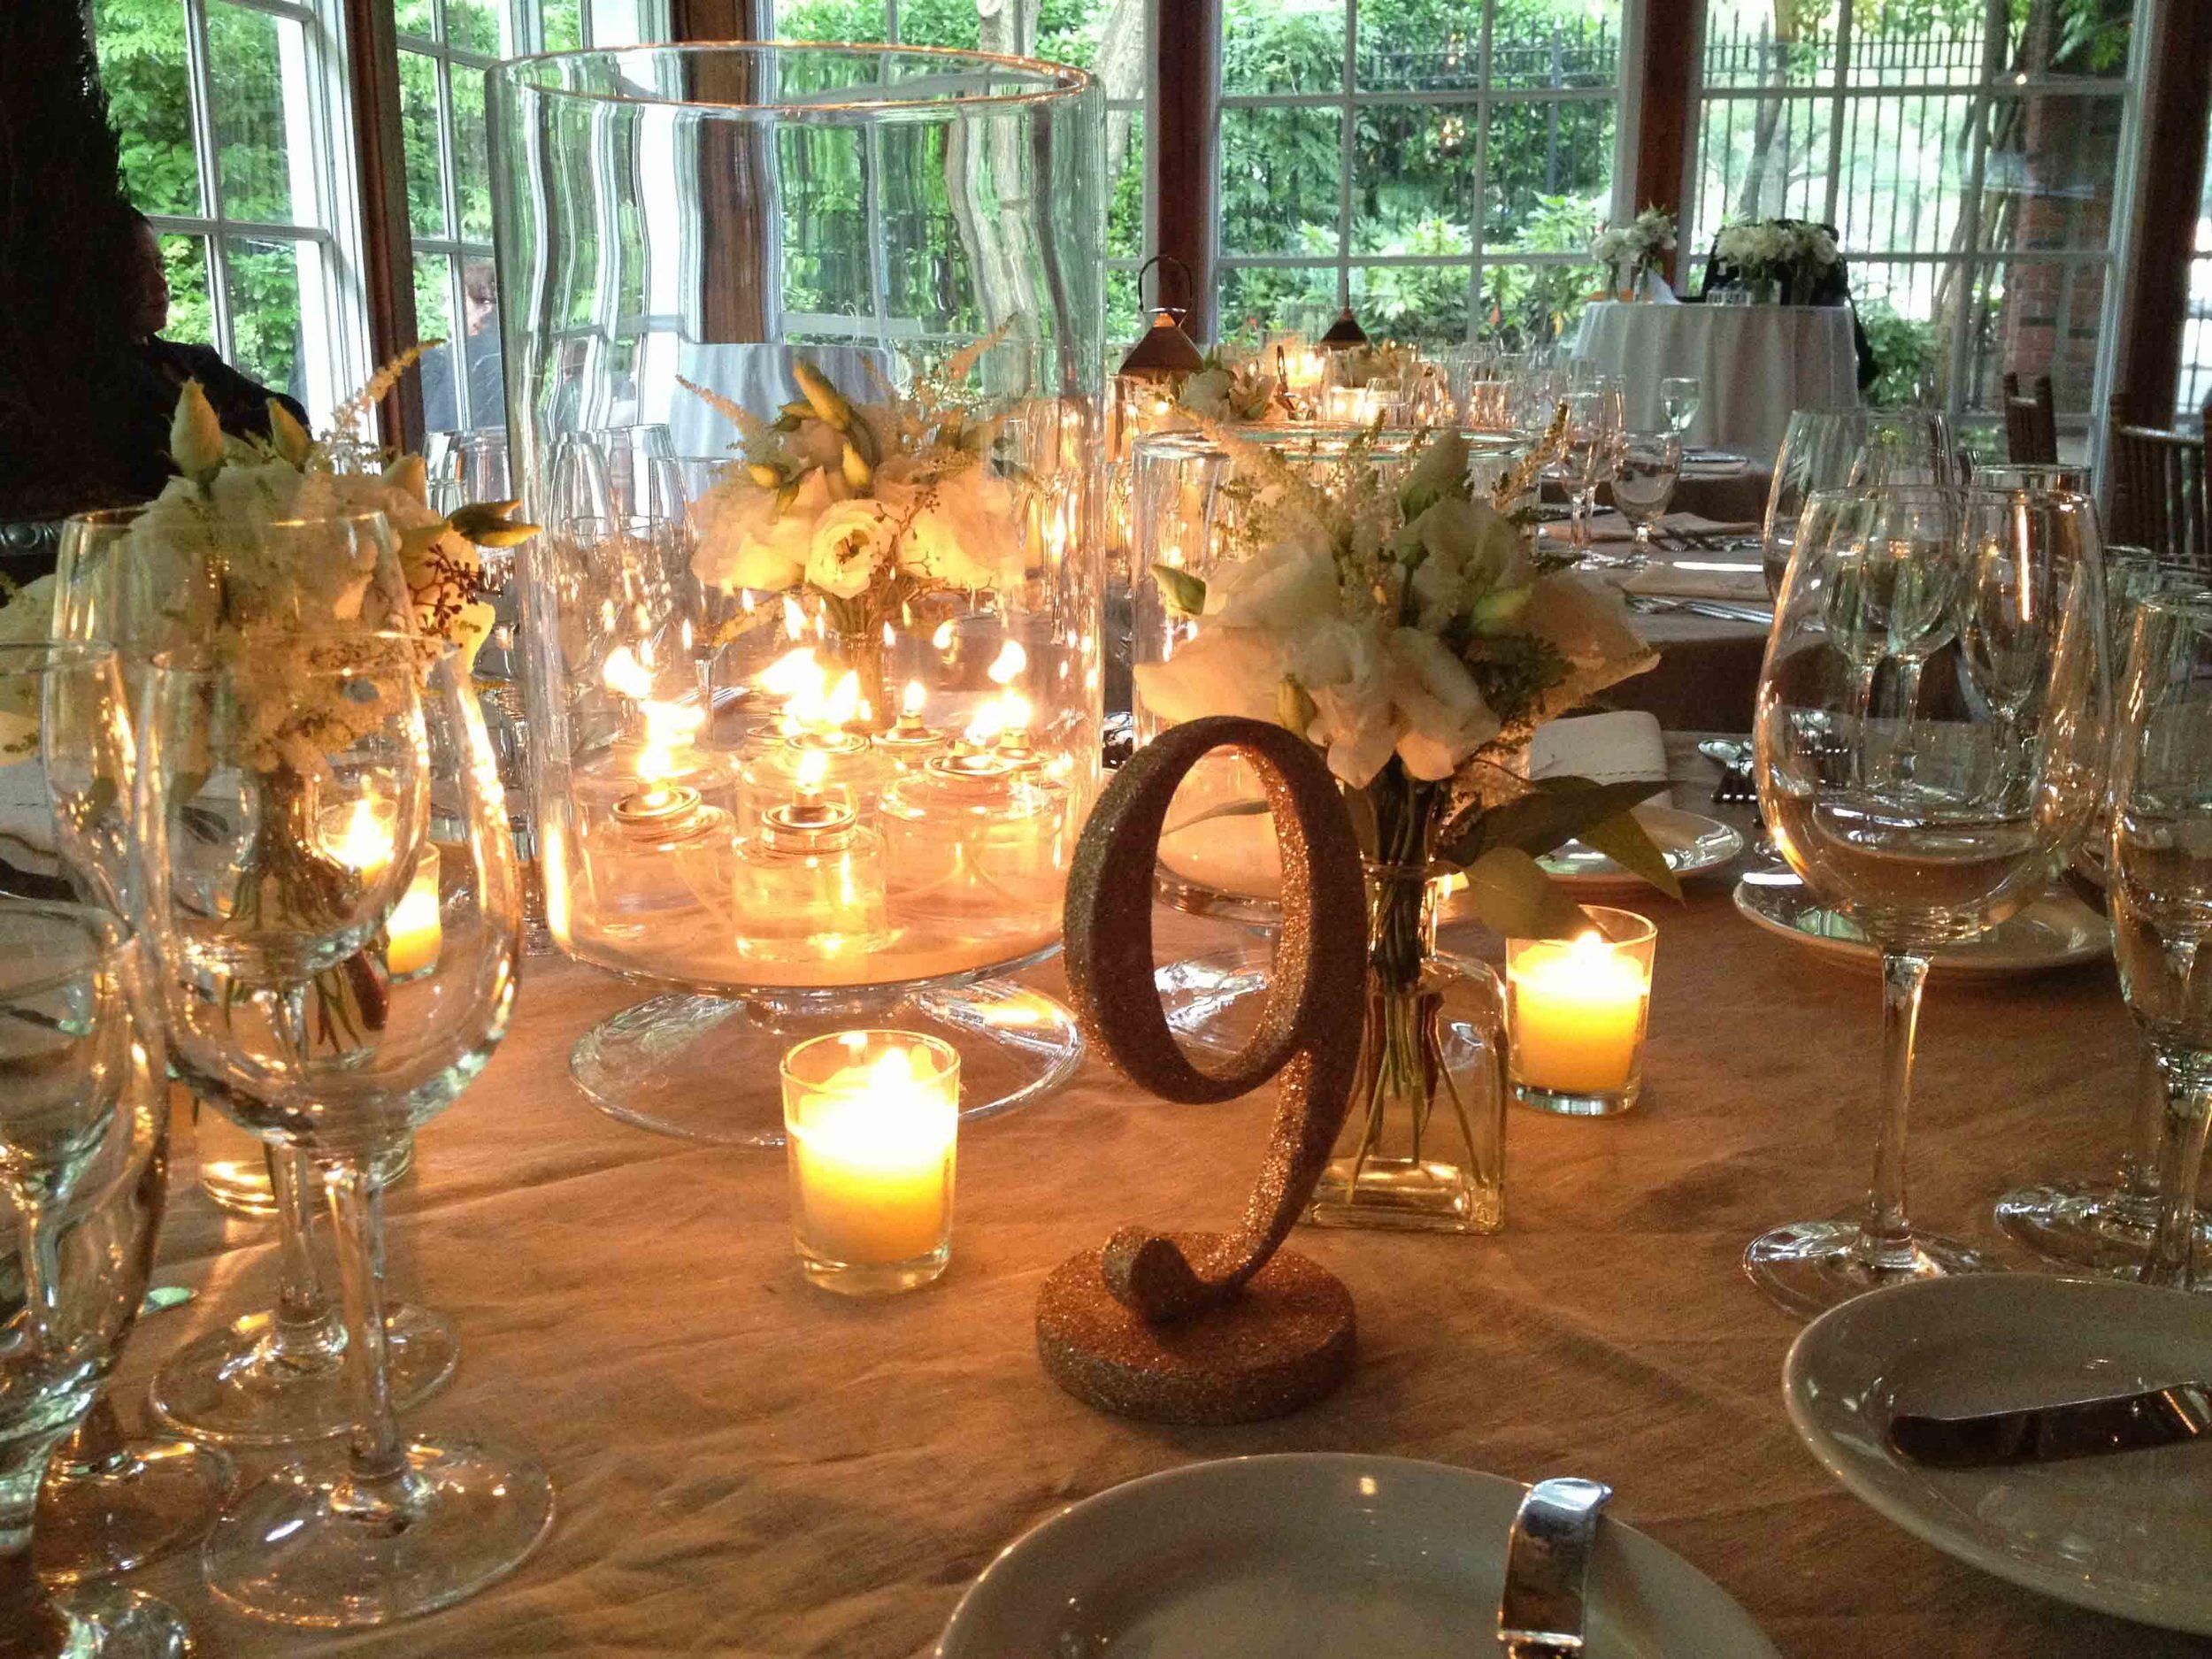 central-park-boathouse-wedding-candle-centerpiece